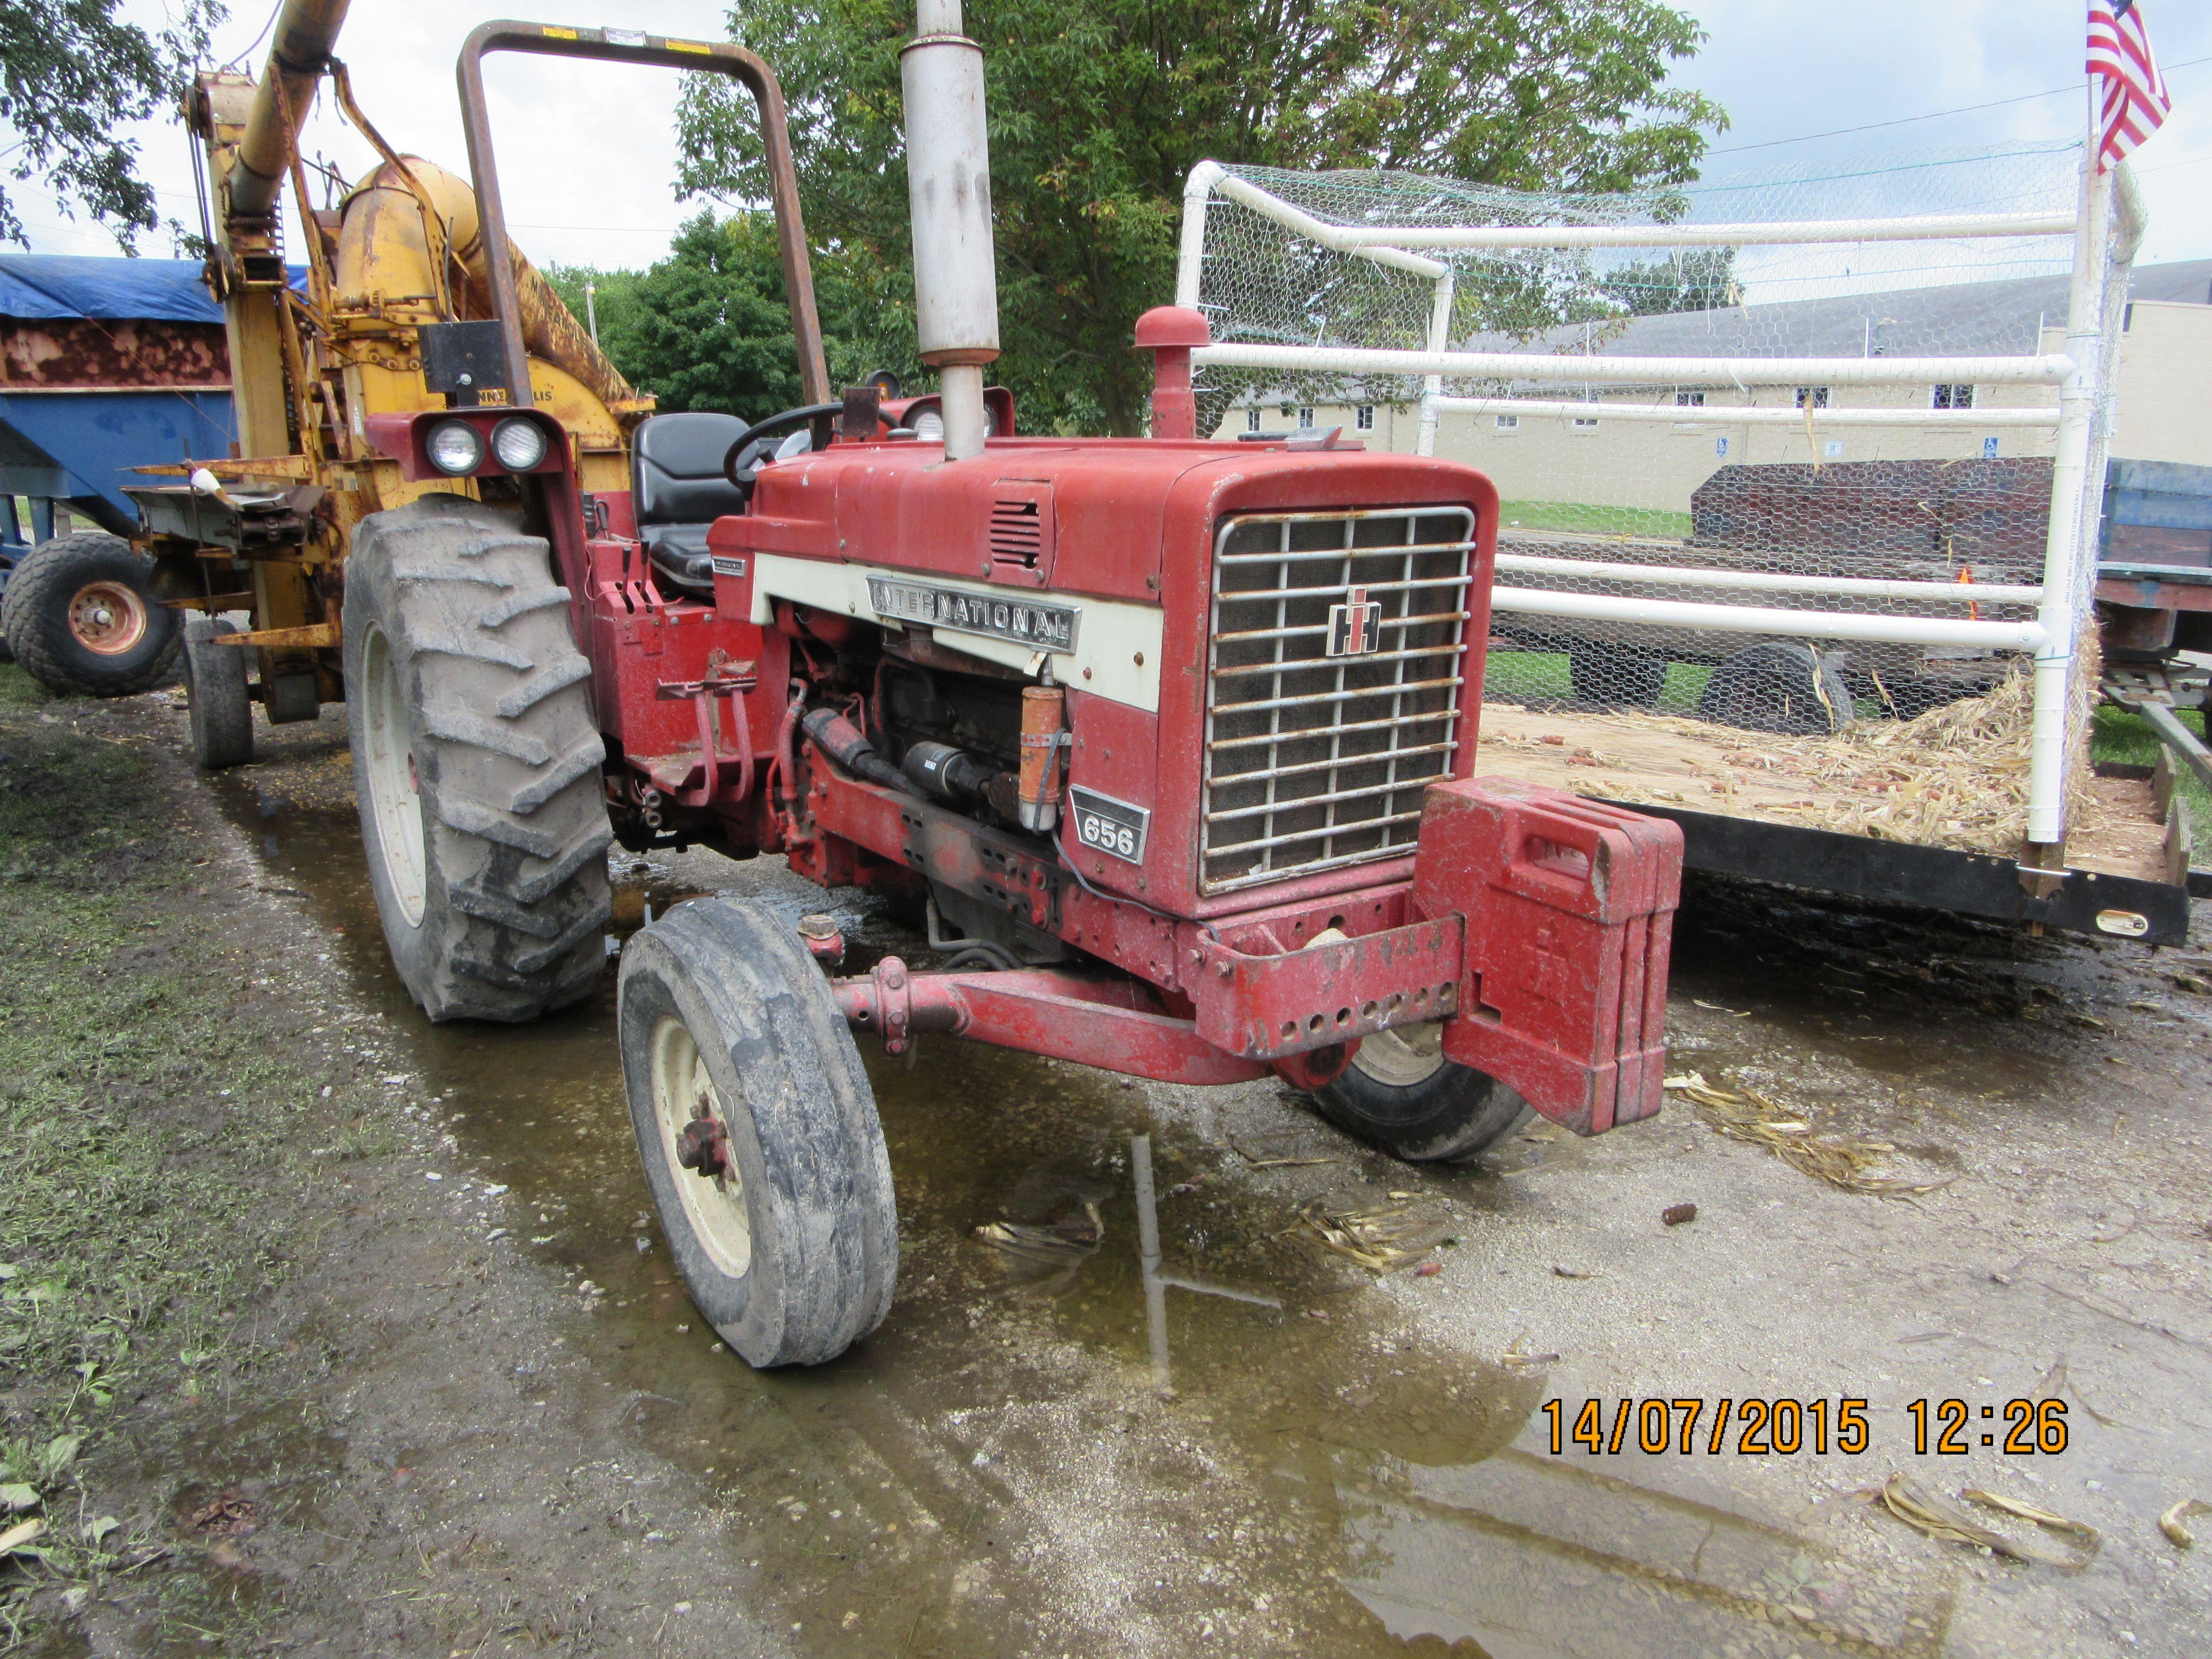 Front of International Harvester 656 Hydrostatic